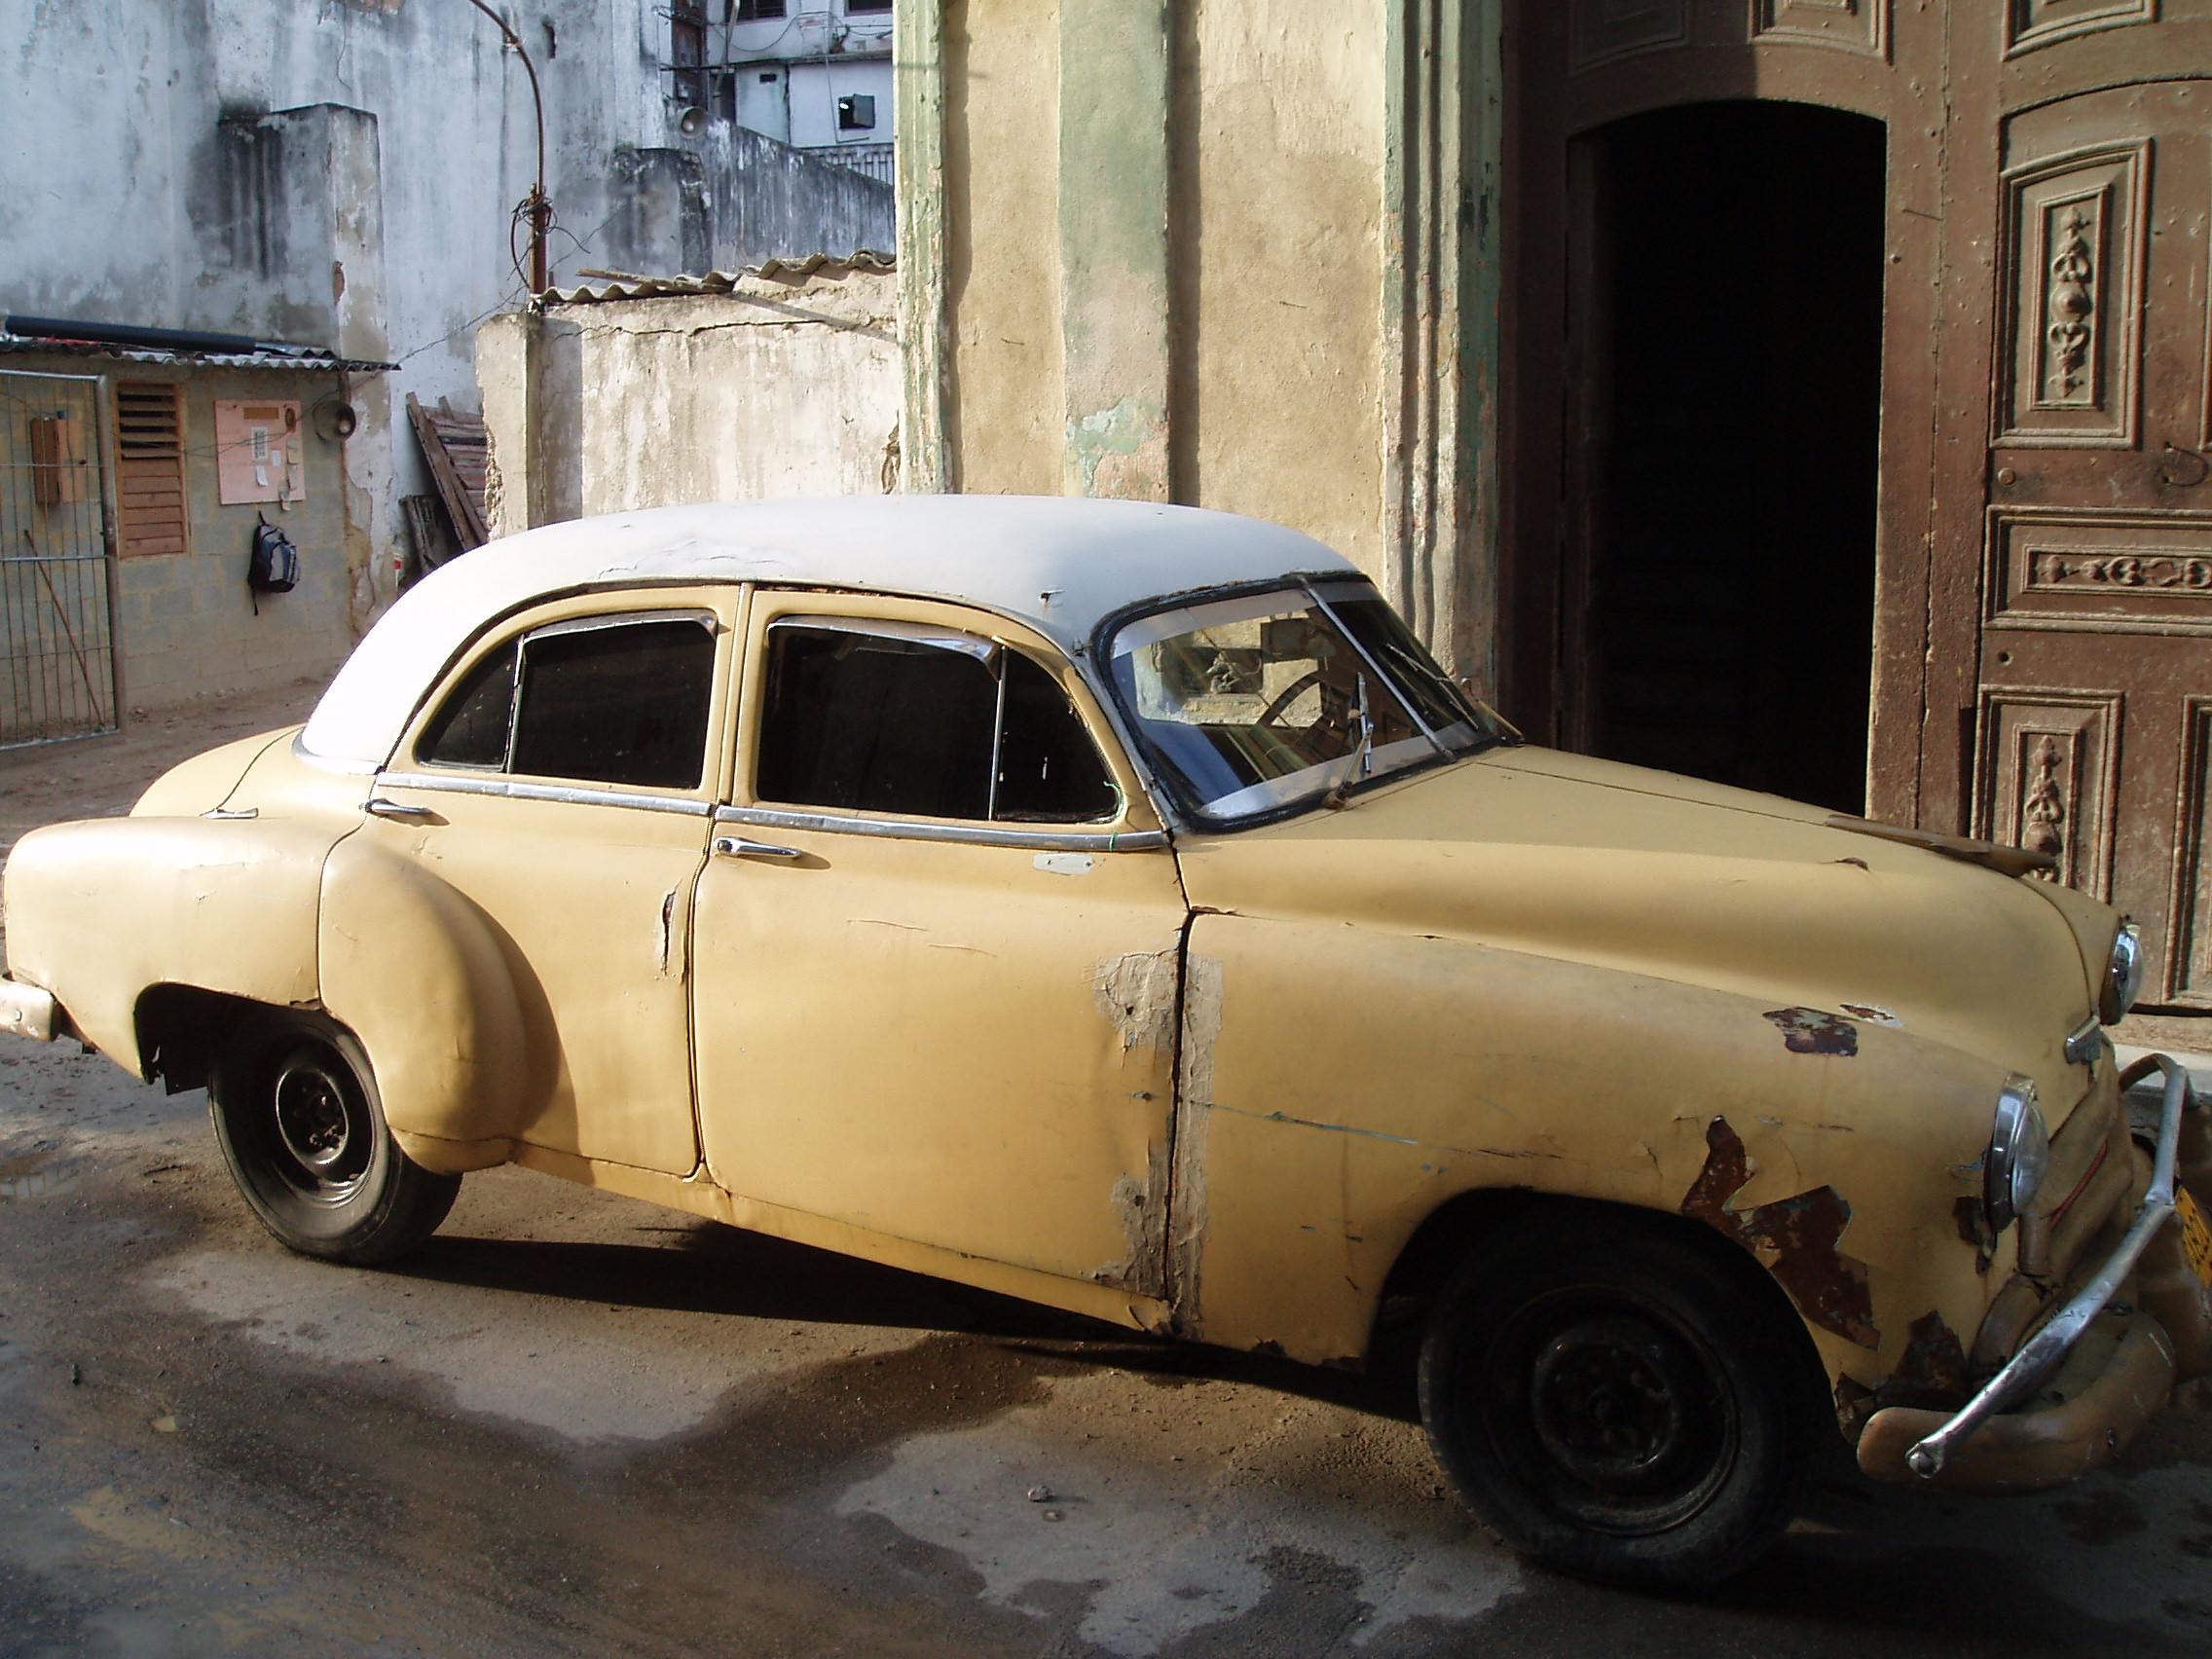 file cuban style car jpg wikimedia commons. Black Bedroom Furniture Sets. Home Design Ideas